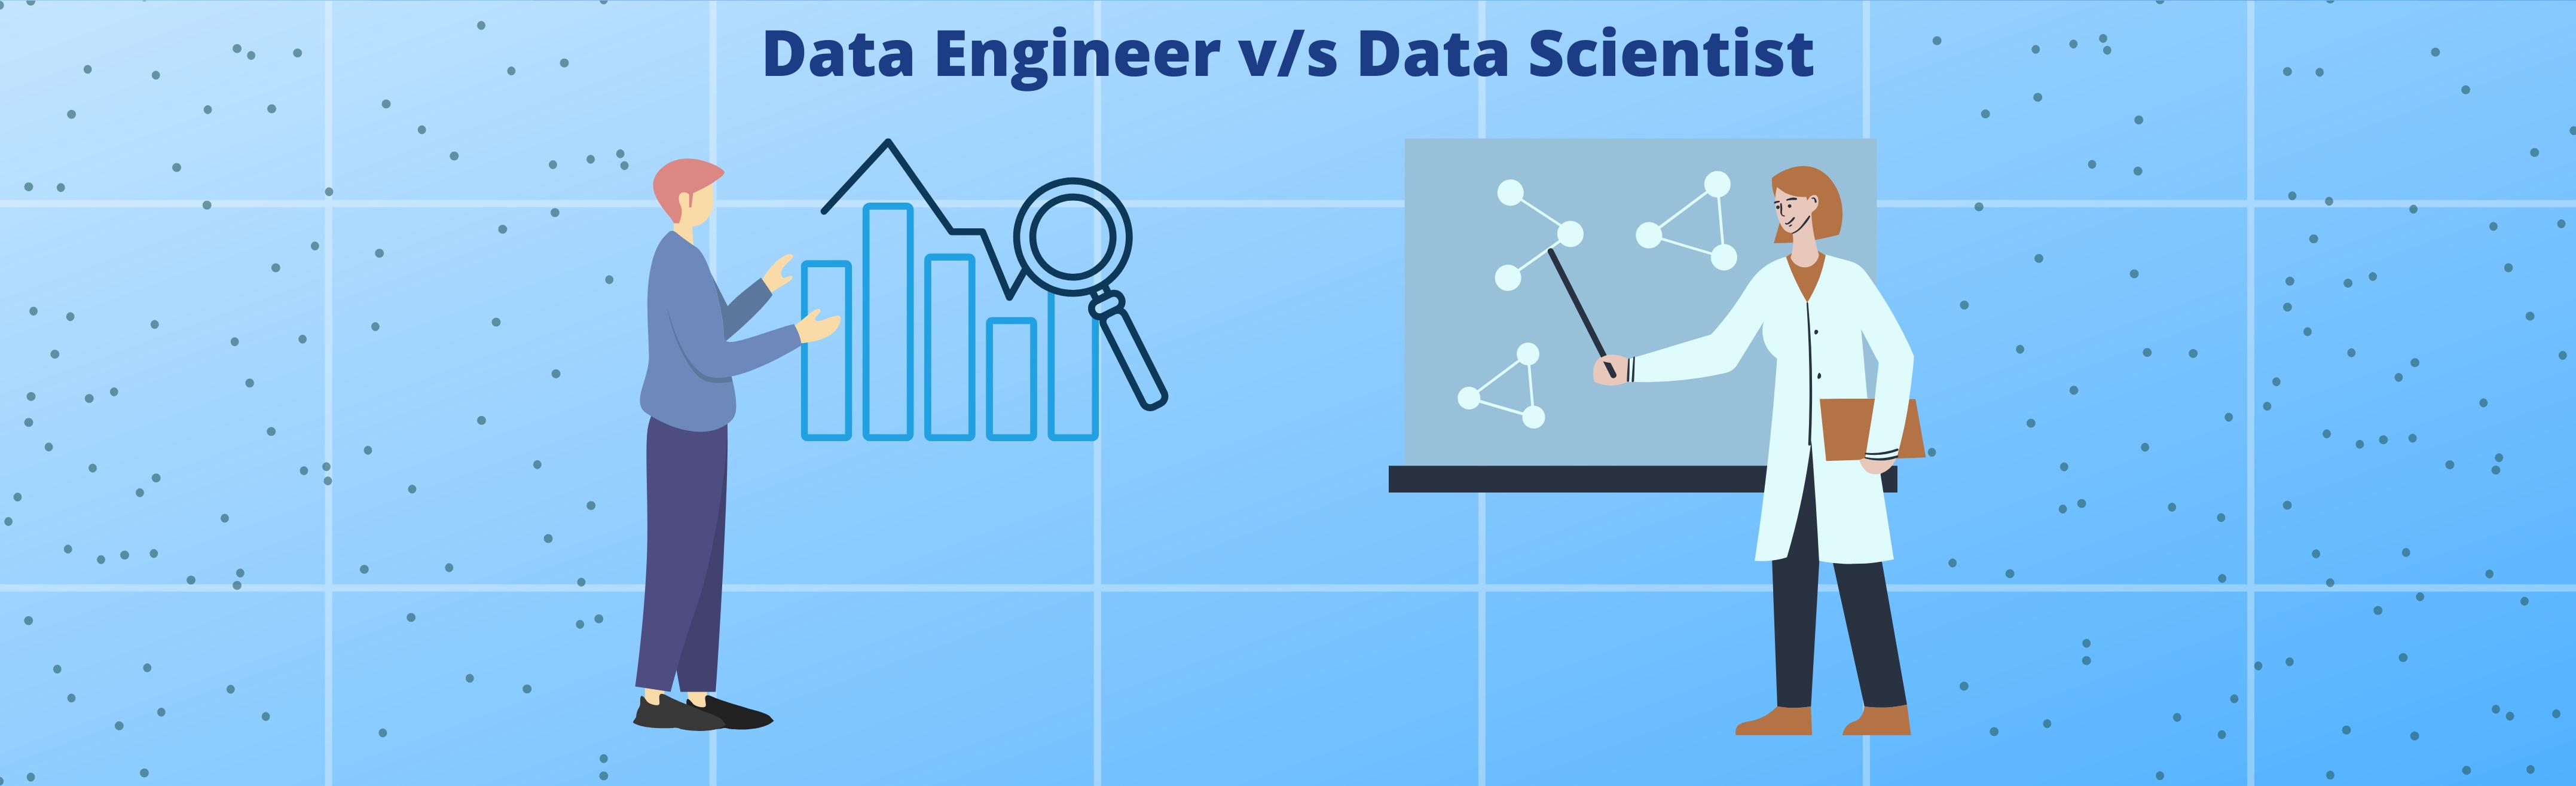 Data Engineers Vs Data Scientists